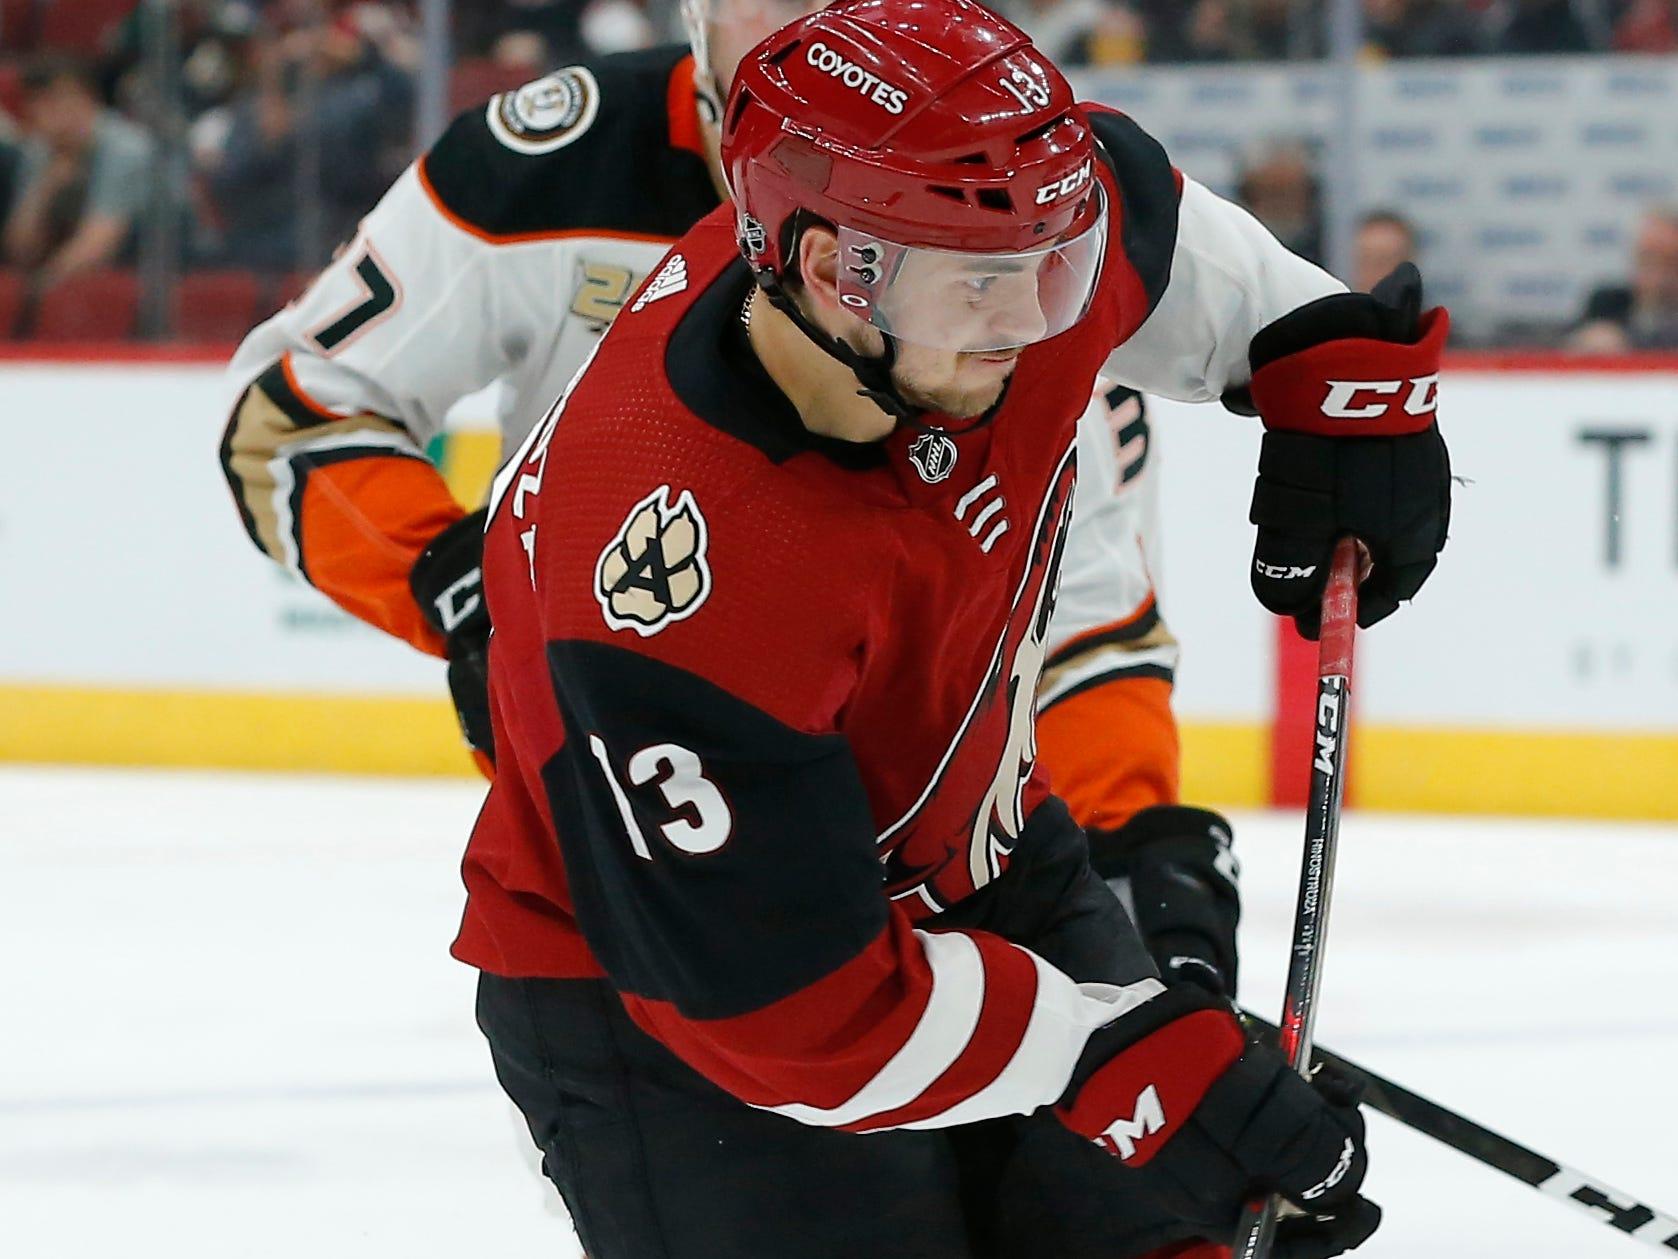 Arizona Coyotes defenseman Alex Goligoski (33) scores a goal against the Anaheim Ducks in the second period during an NHL hockey game, Thursday, March 14, 2019, in Glendale, Ariz.